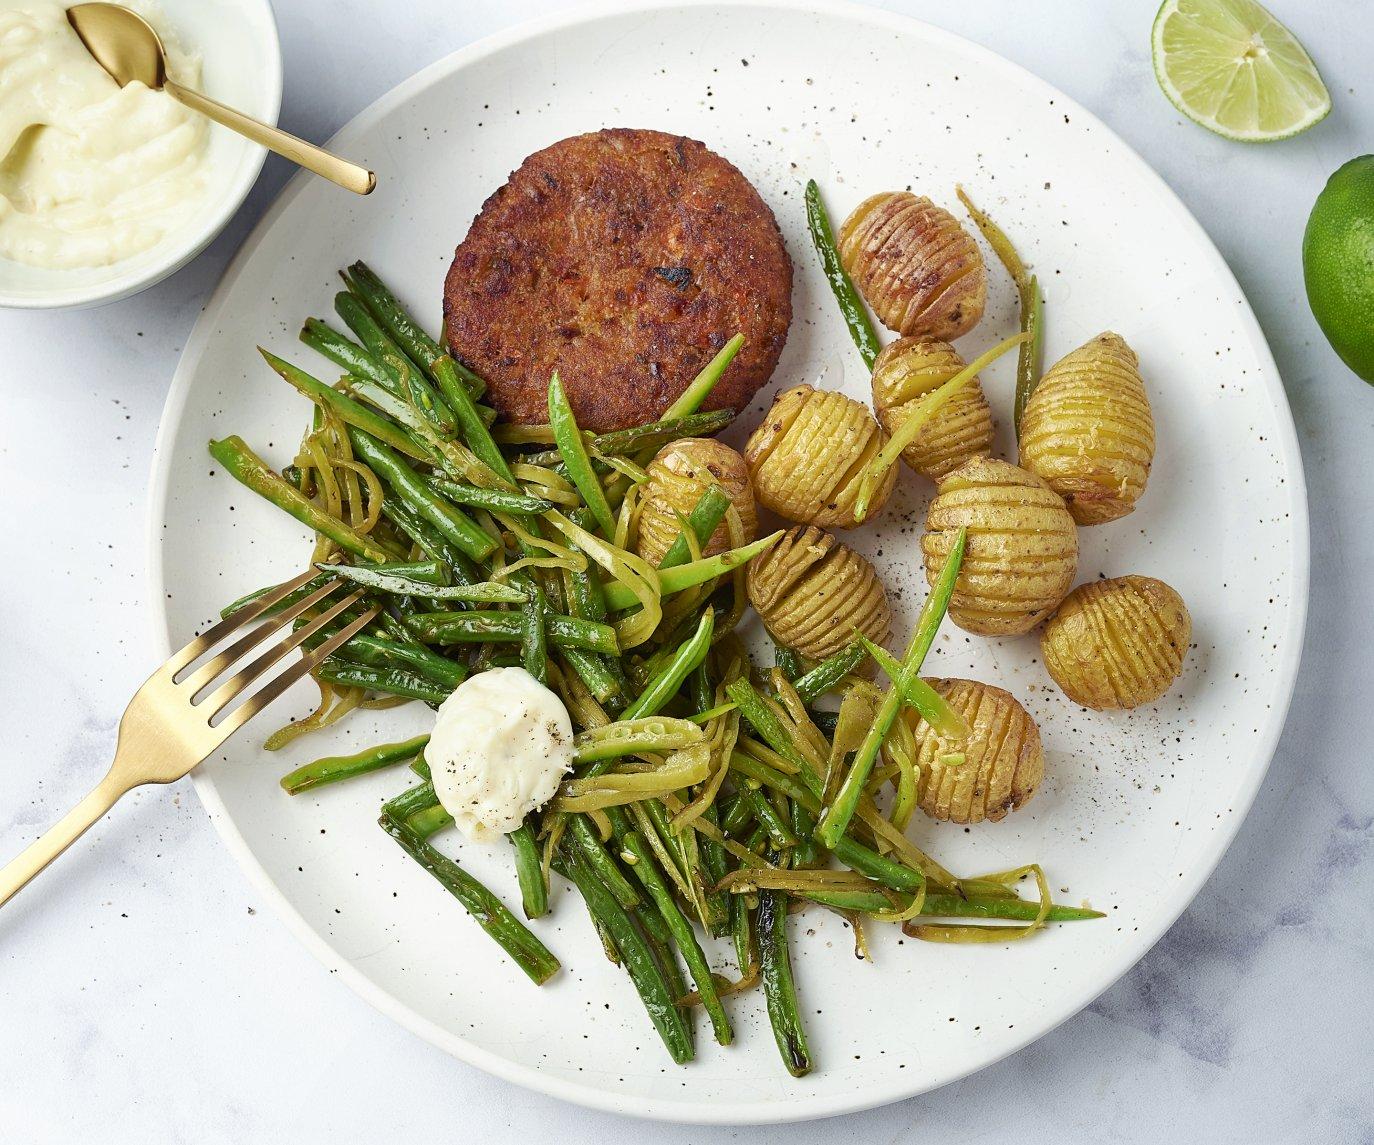 Groenteburgers met hasselback aardappelen, knapperige groene groenten en aioli